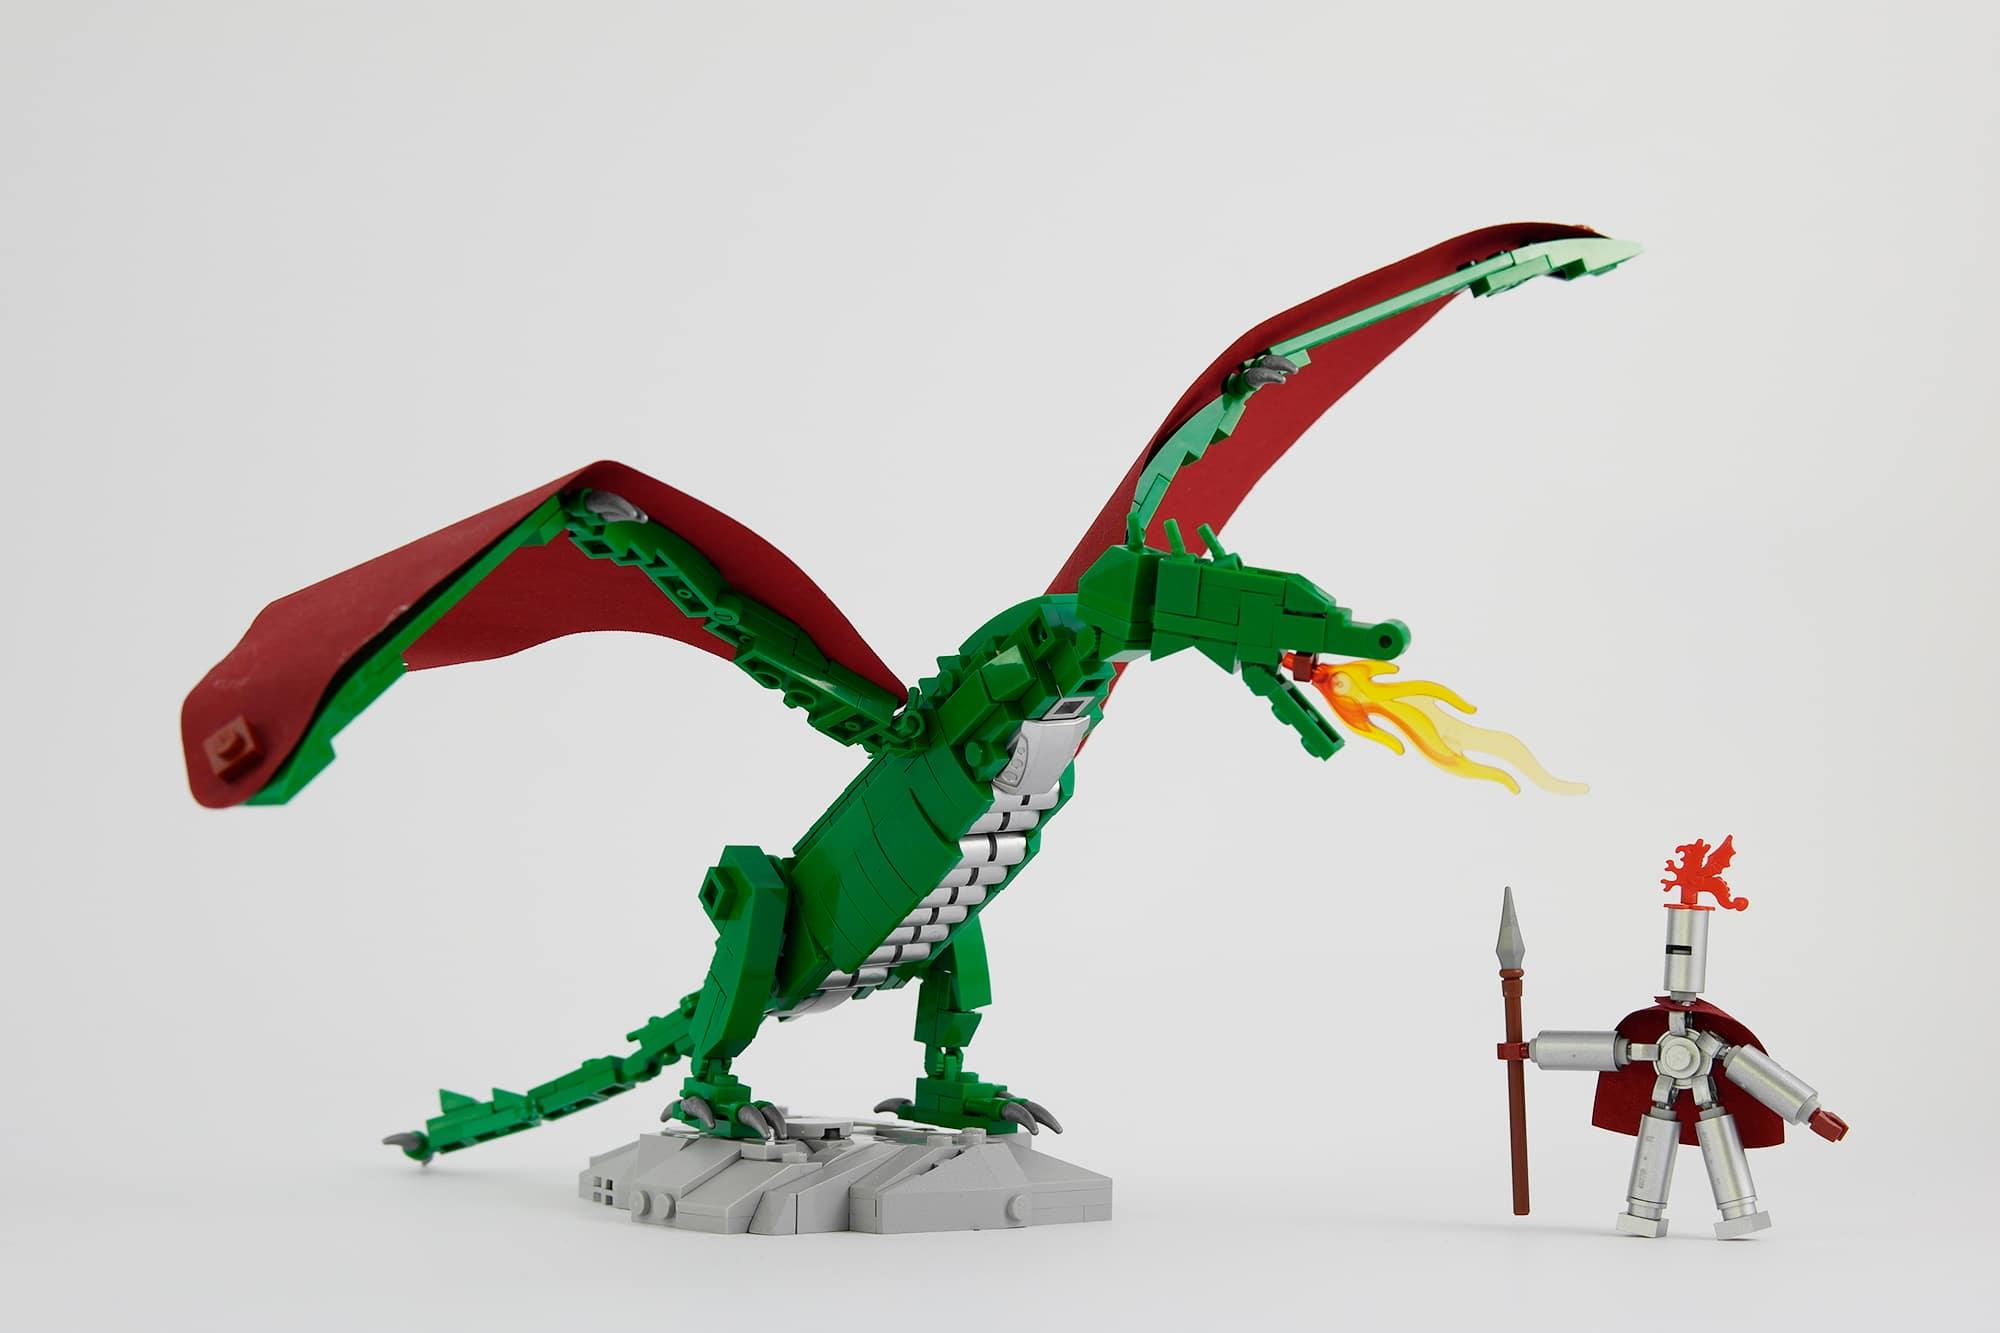 LEGO Moc Iron Builder 2016 Ritter